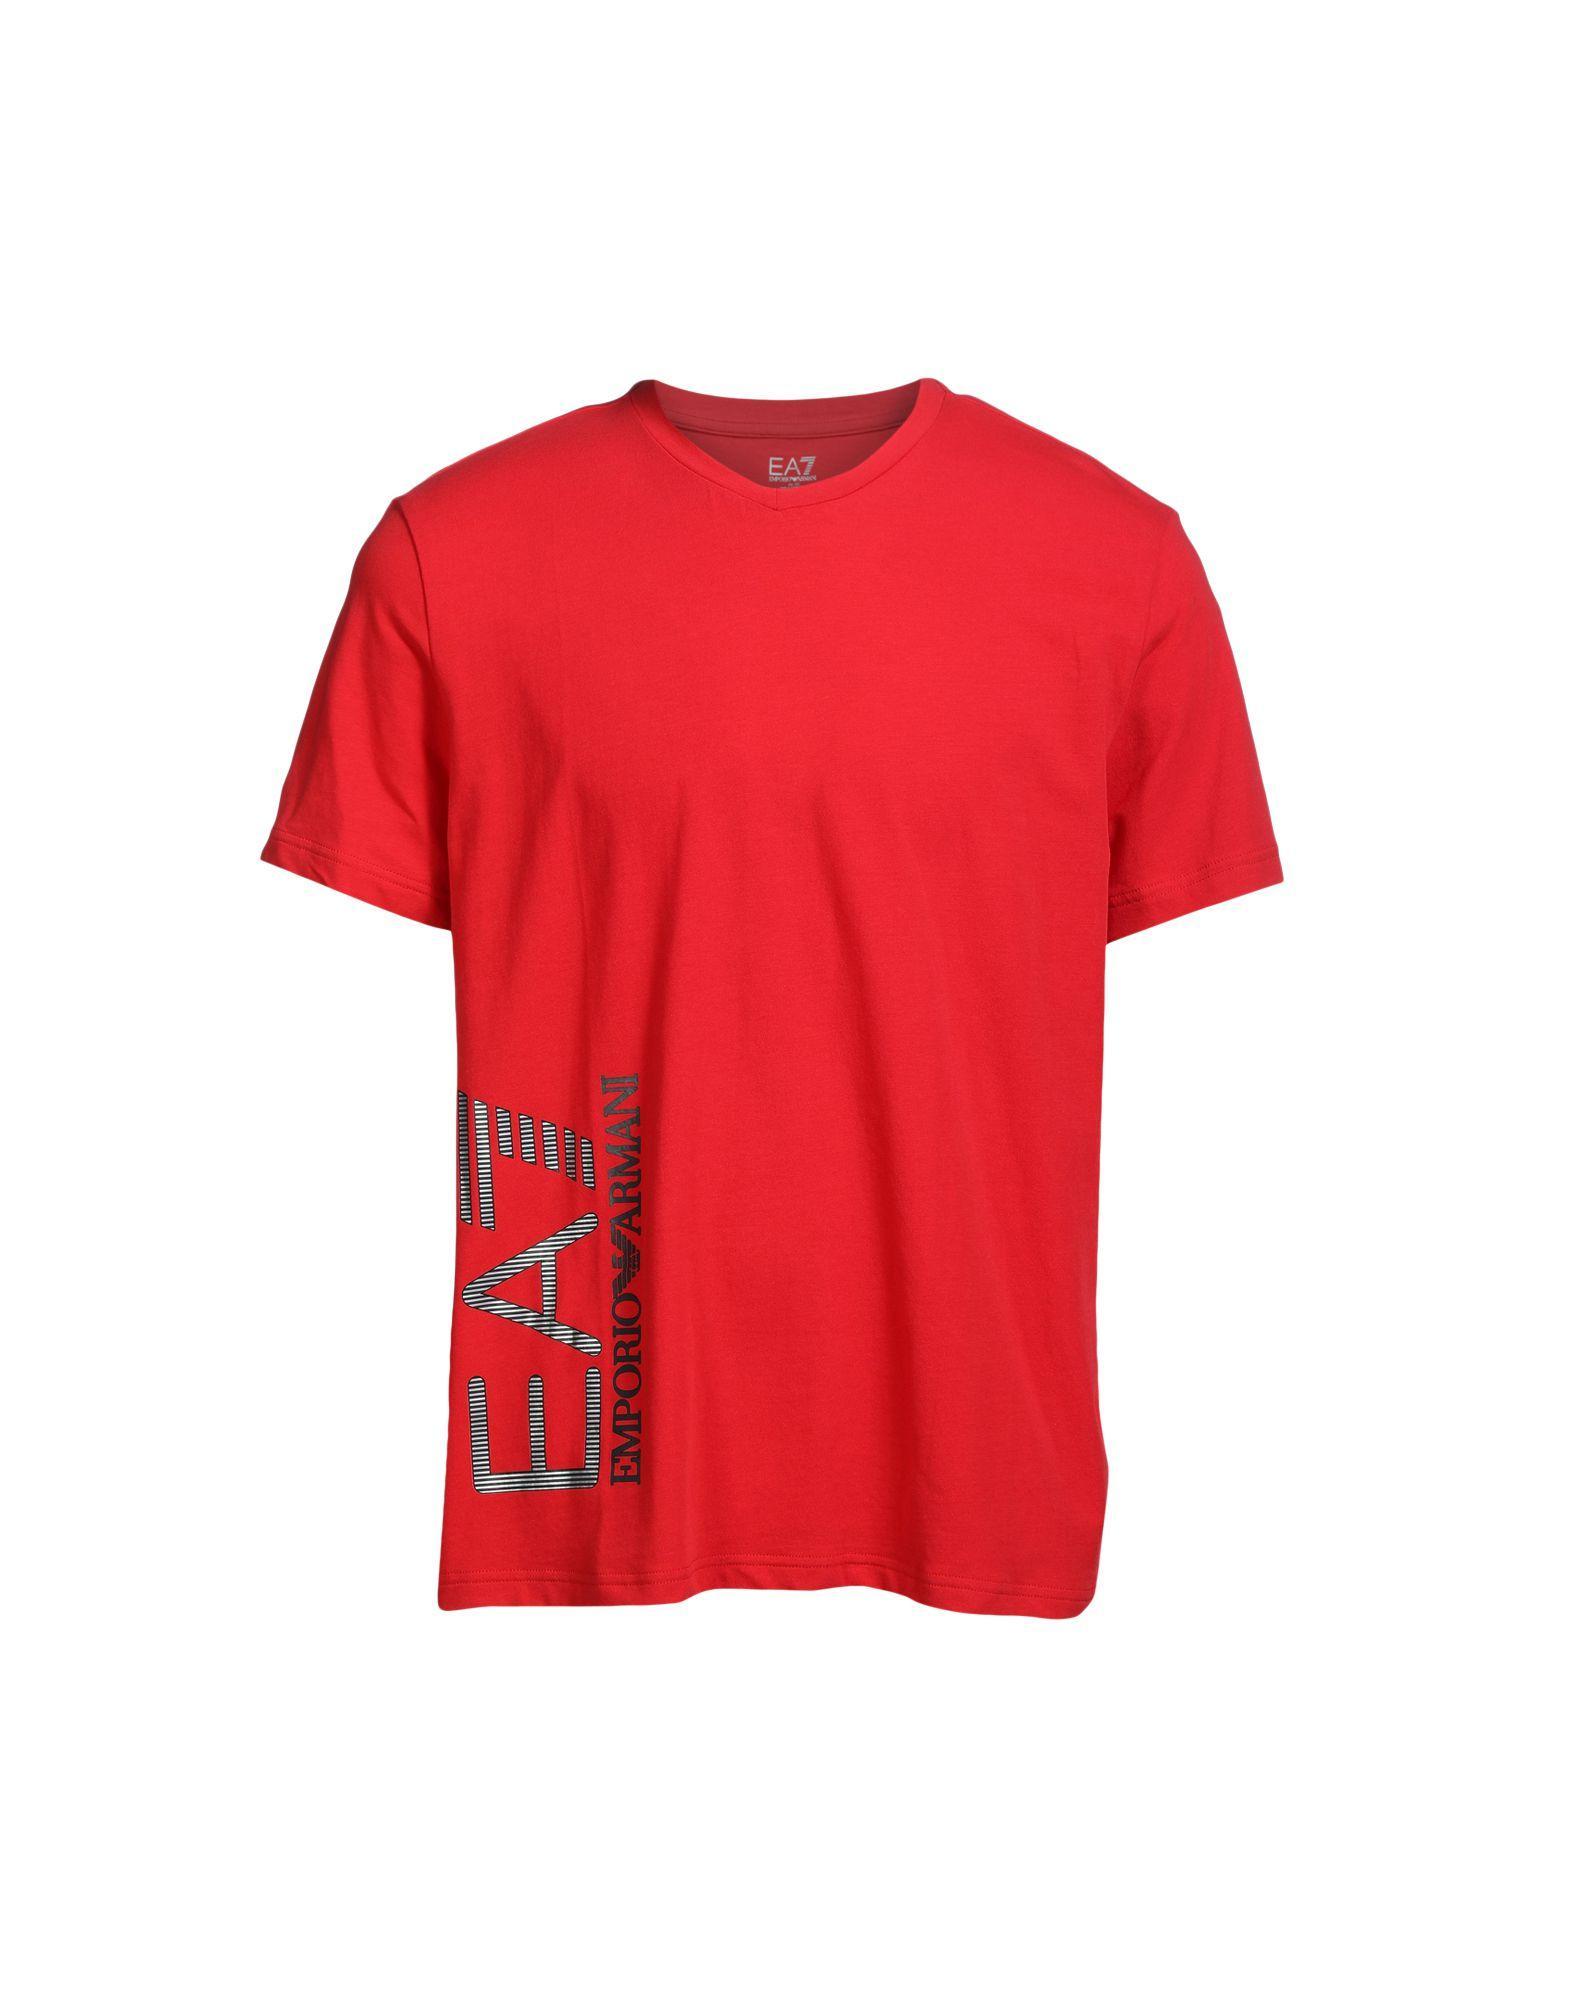 Emporio Armani Shirt In Red